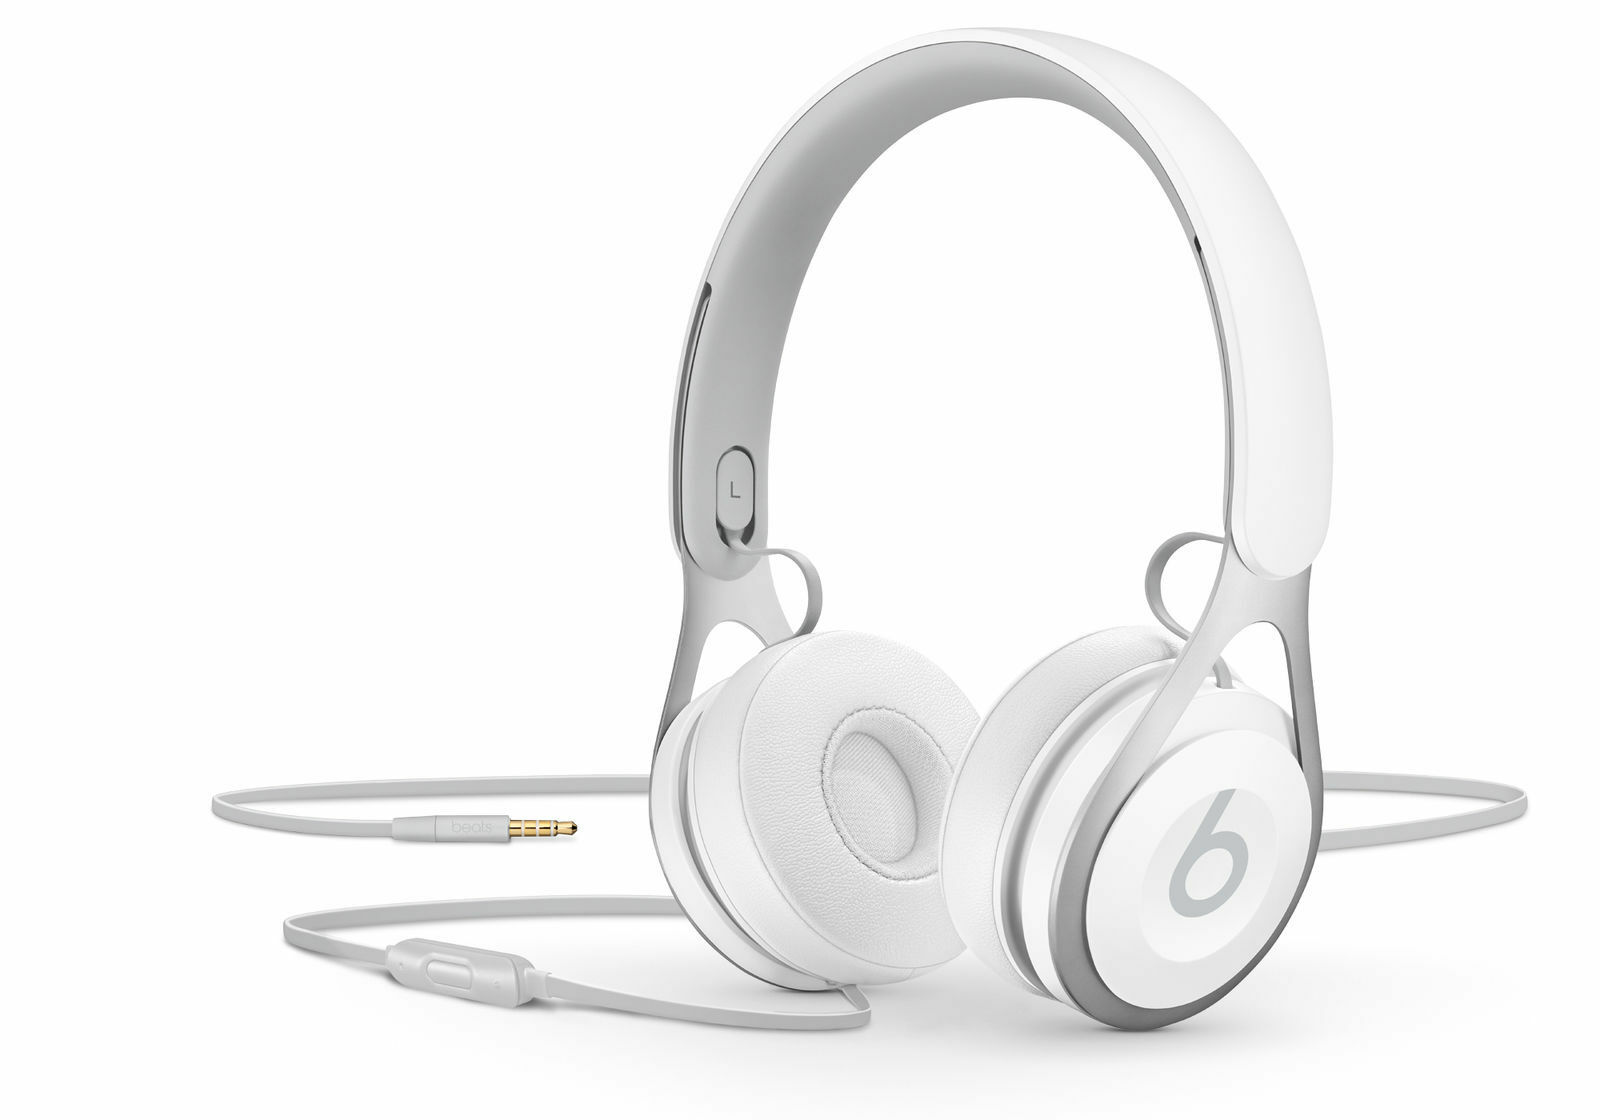 Beats By Dr Dre Ep Headband Headphones White Ebay Headphone Solo Hd1 Stock Photo